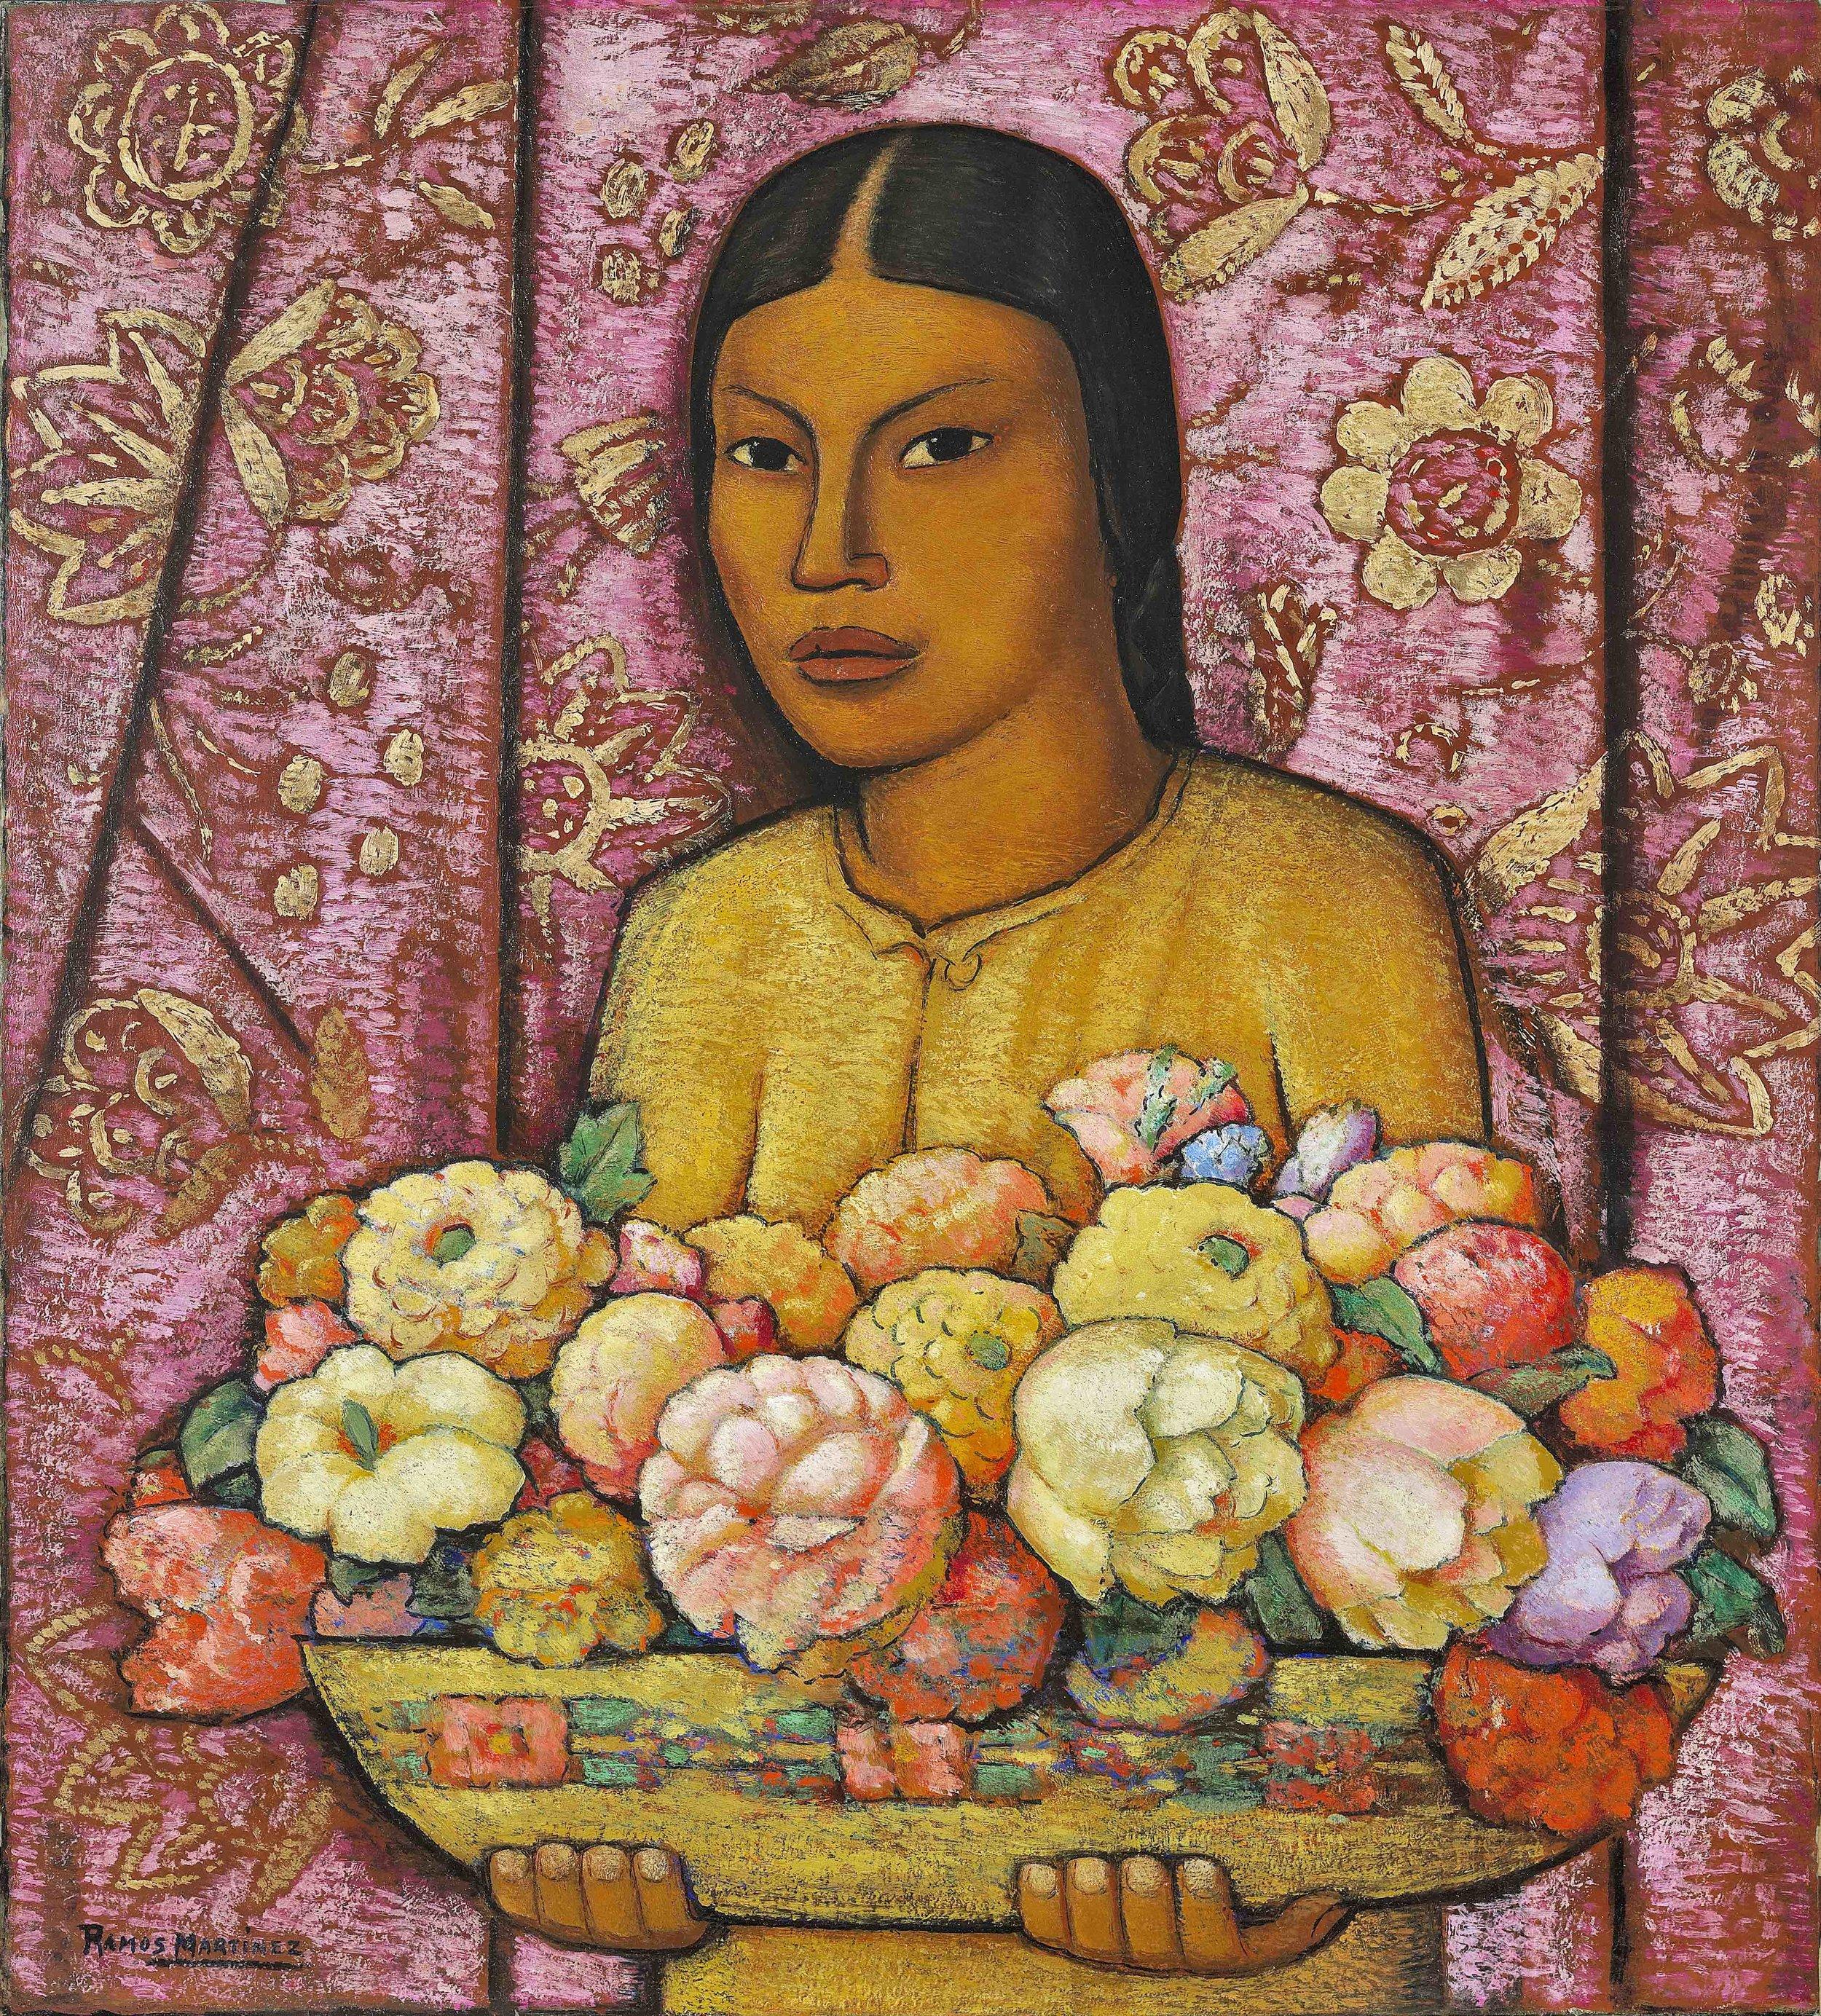 La Florera de Santa Anita / The Flower Girl from Santa Anita  ca. 1932 oil on canvas / óleo sobre tela 26 x 23.5 inches; 66 x 59.7 centímetros Private collection